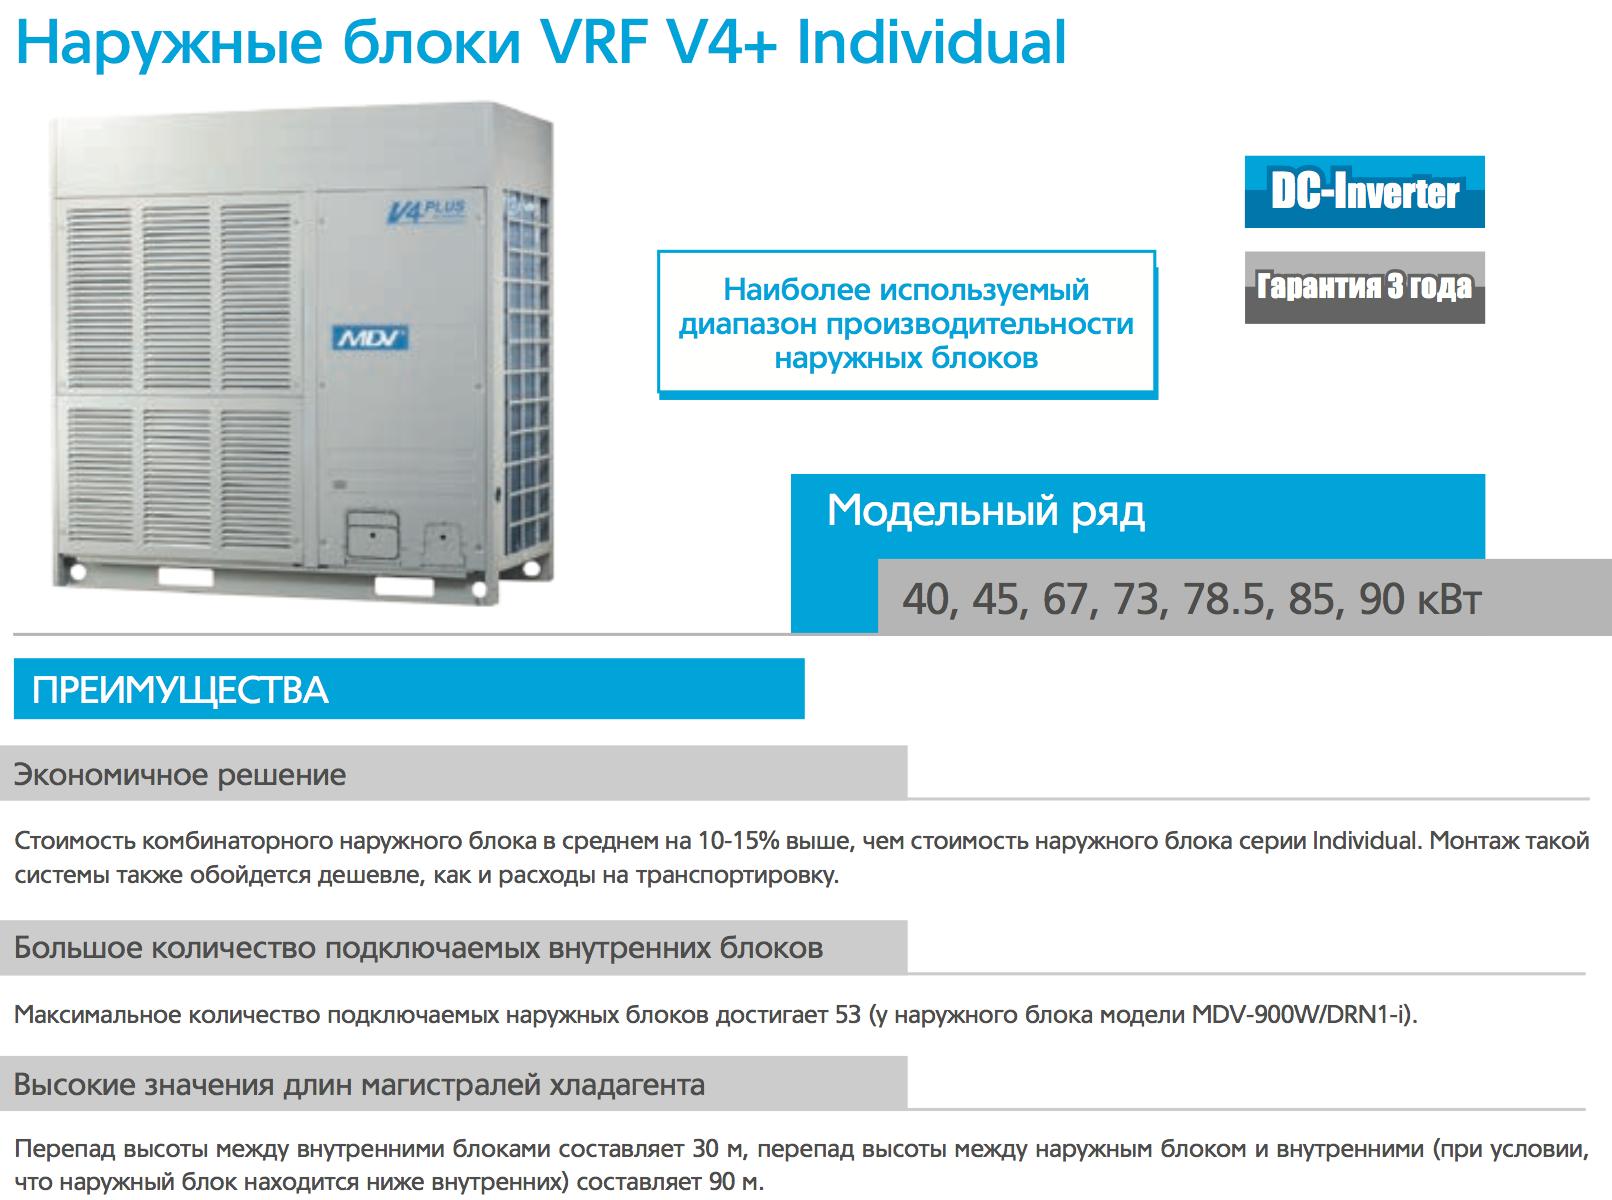 Наружные_блоки_MDV_VRF_V4__Individual_описание.png